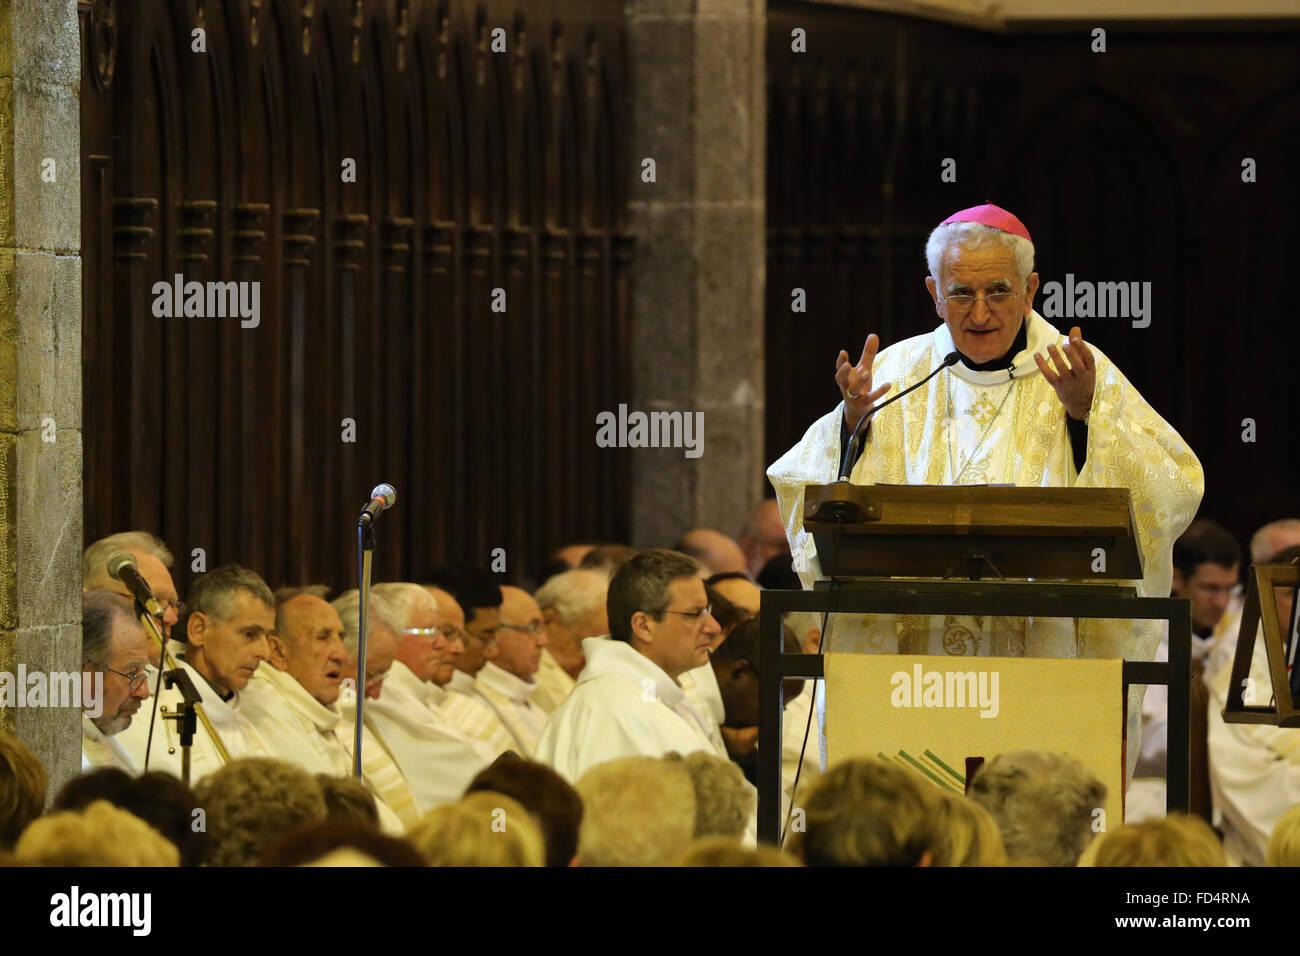 Liturgy Of The Word Stock Photos & Liturgy Of The Word Stock